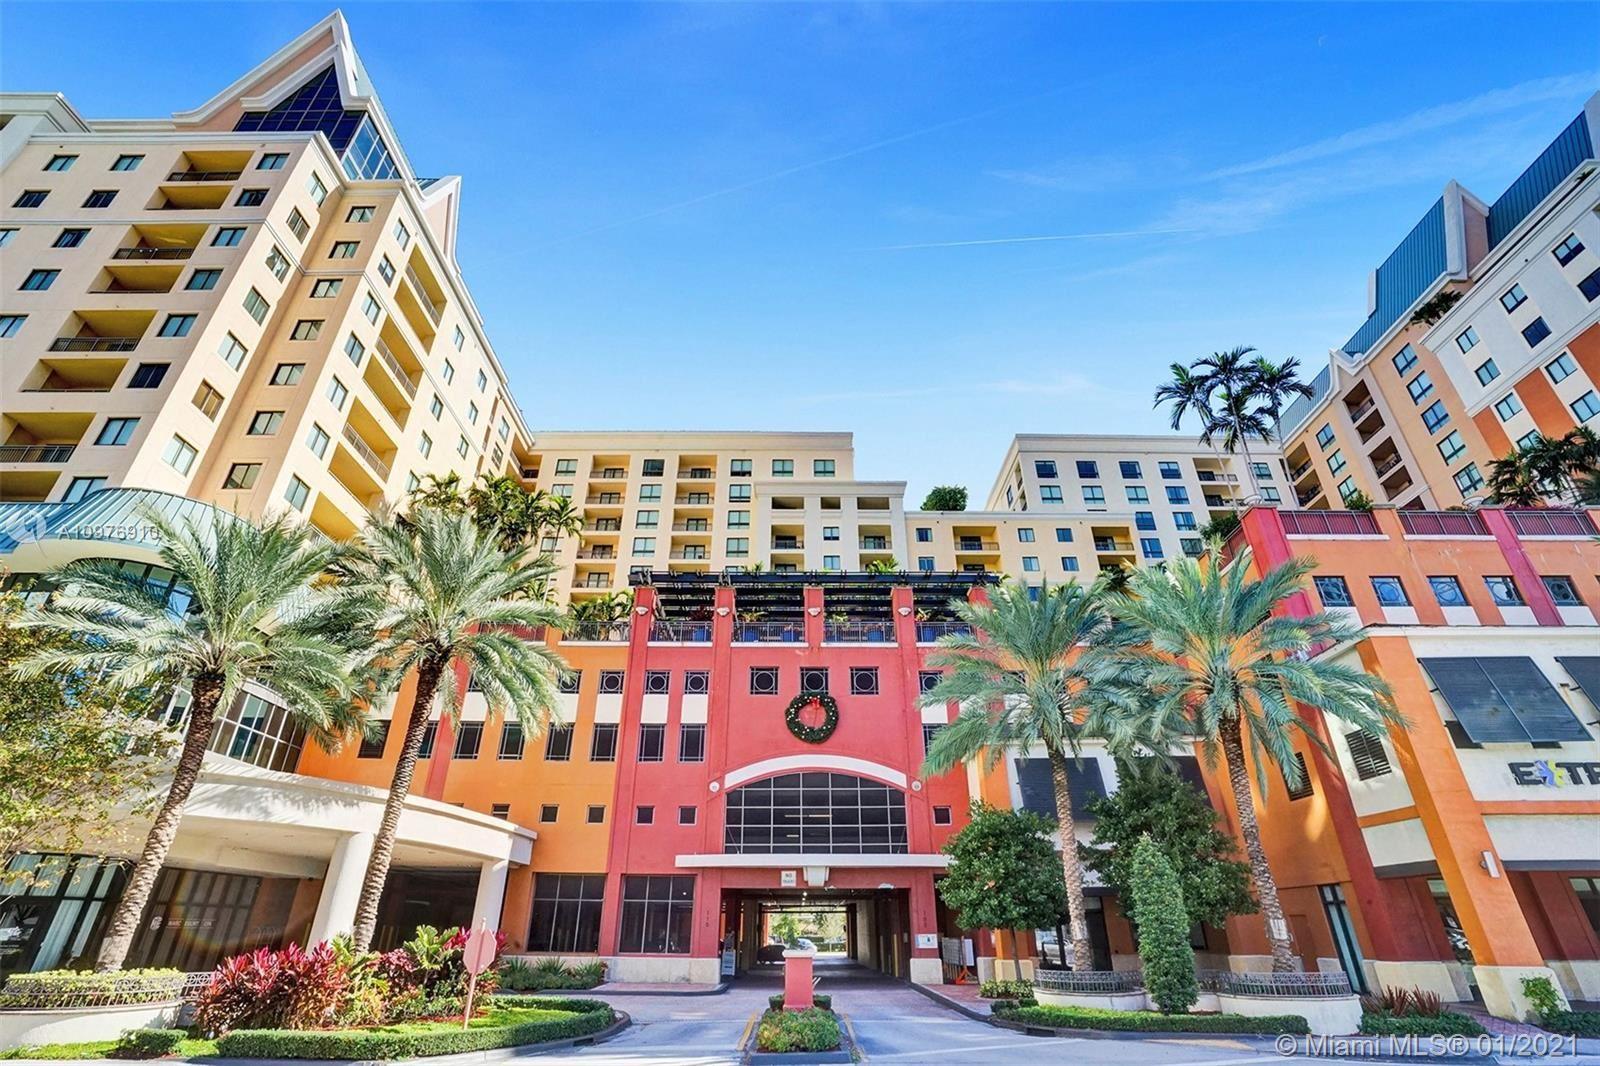 110 N Federal Hwy #1503, Fort Lauderdale, FL 33301 - #: A10976910